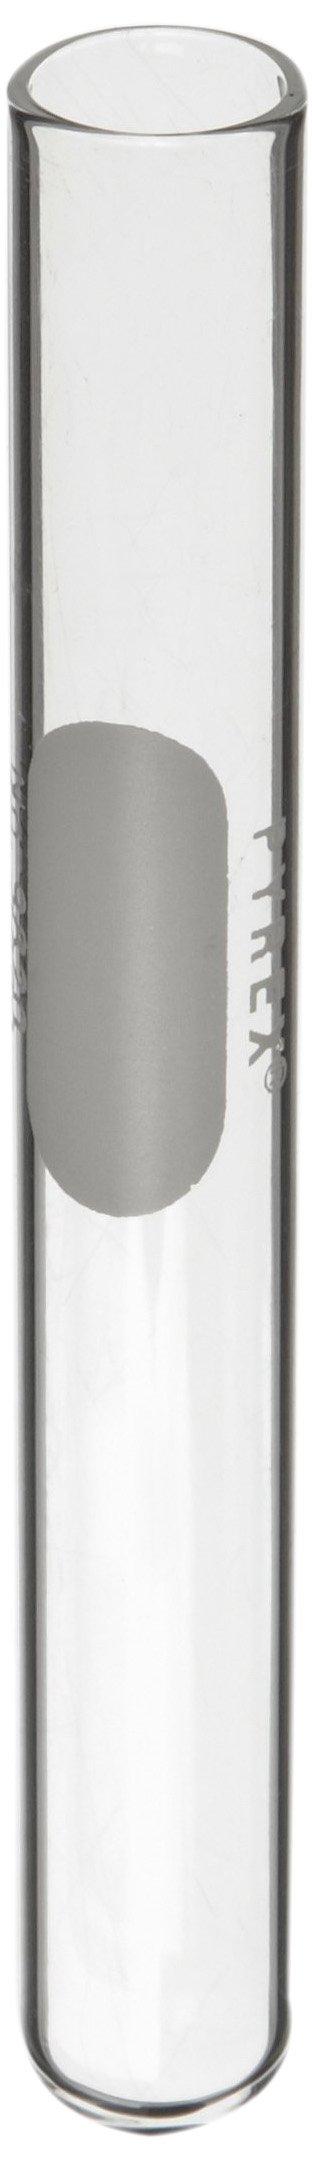 Corning Pyrex 9820-13 Borosilicate Glass Round Bottom 9mL Reusable Rimless Wasserman Culture Tube, 13mm OD x 100mm Length (Pack of 72)